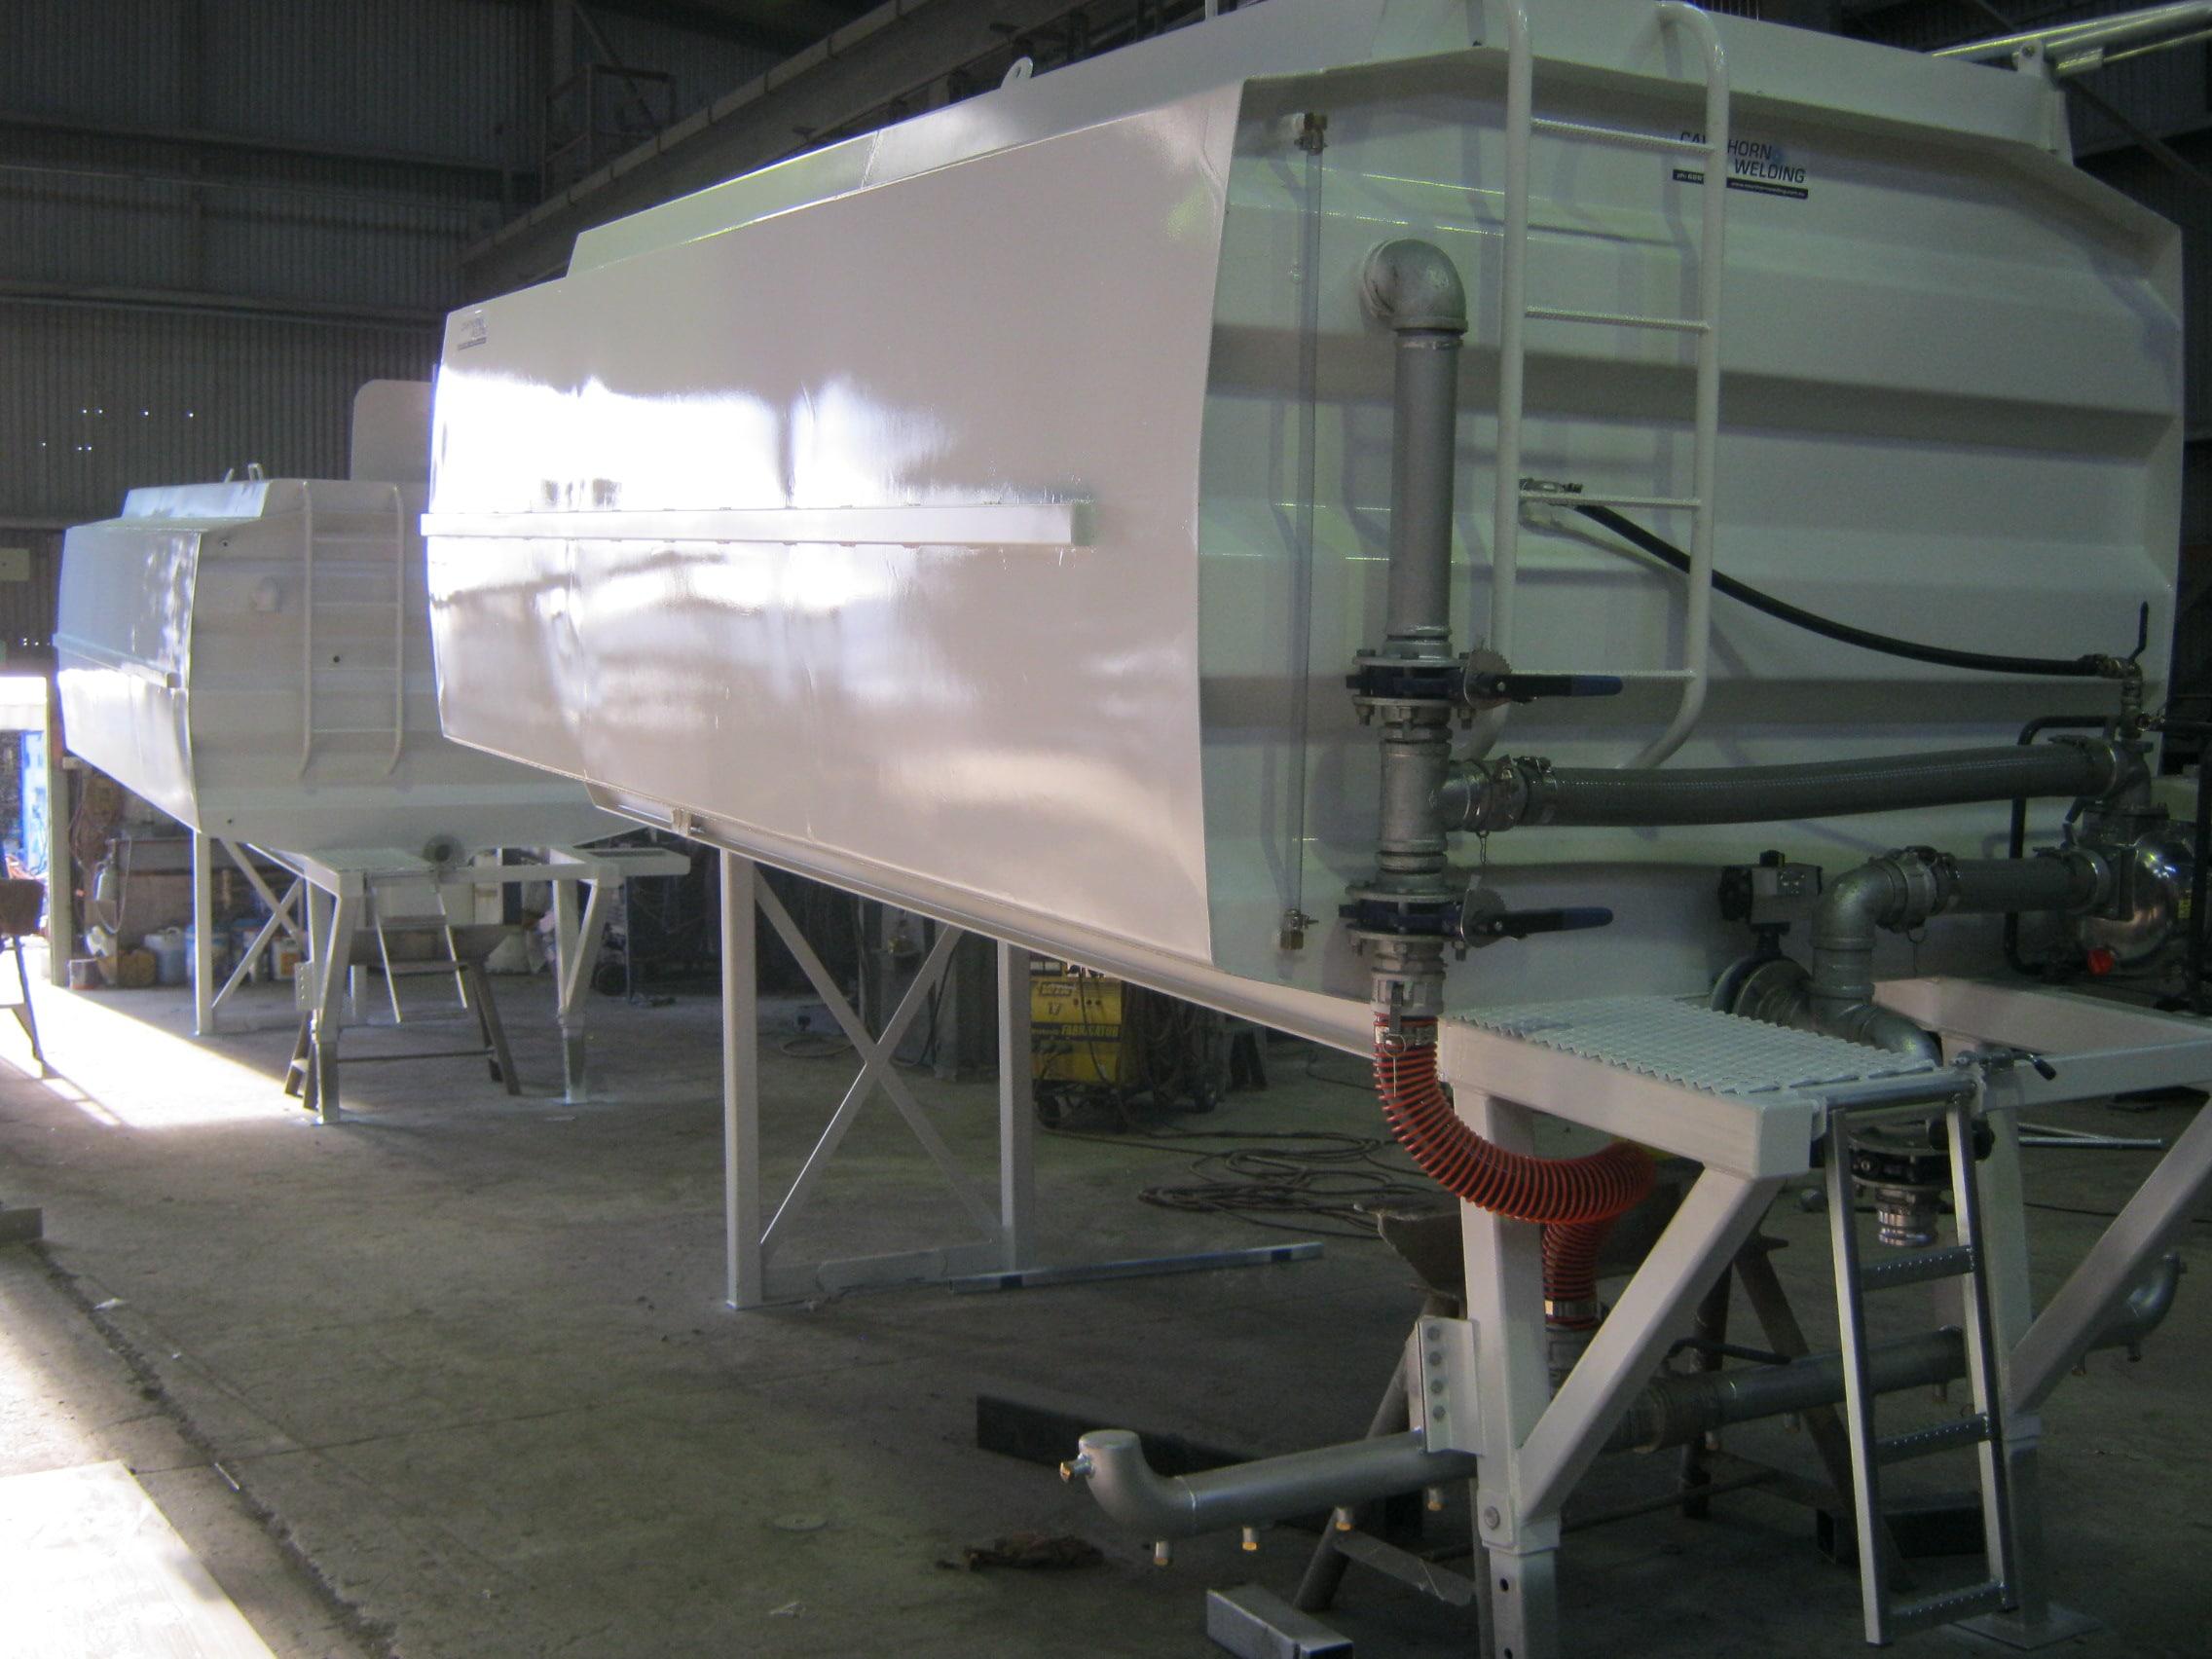 Cawthorn Welding - Steel Fabrication & Supplies - Electrona Industrial Estate - Electrona